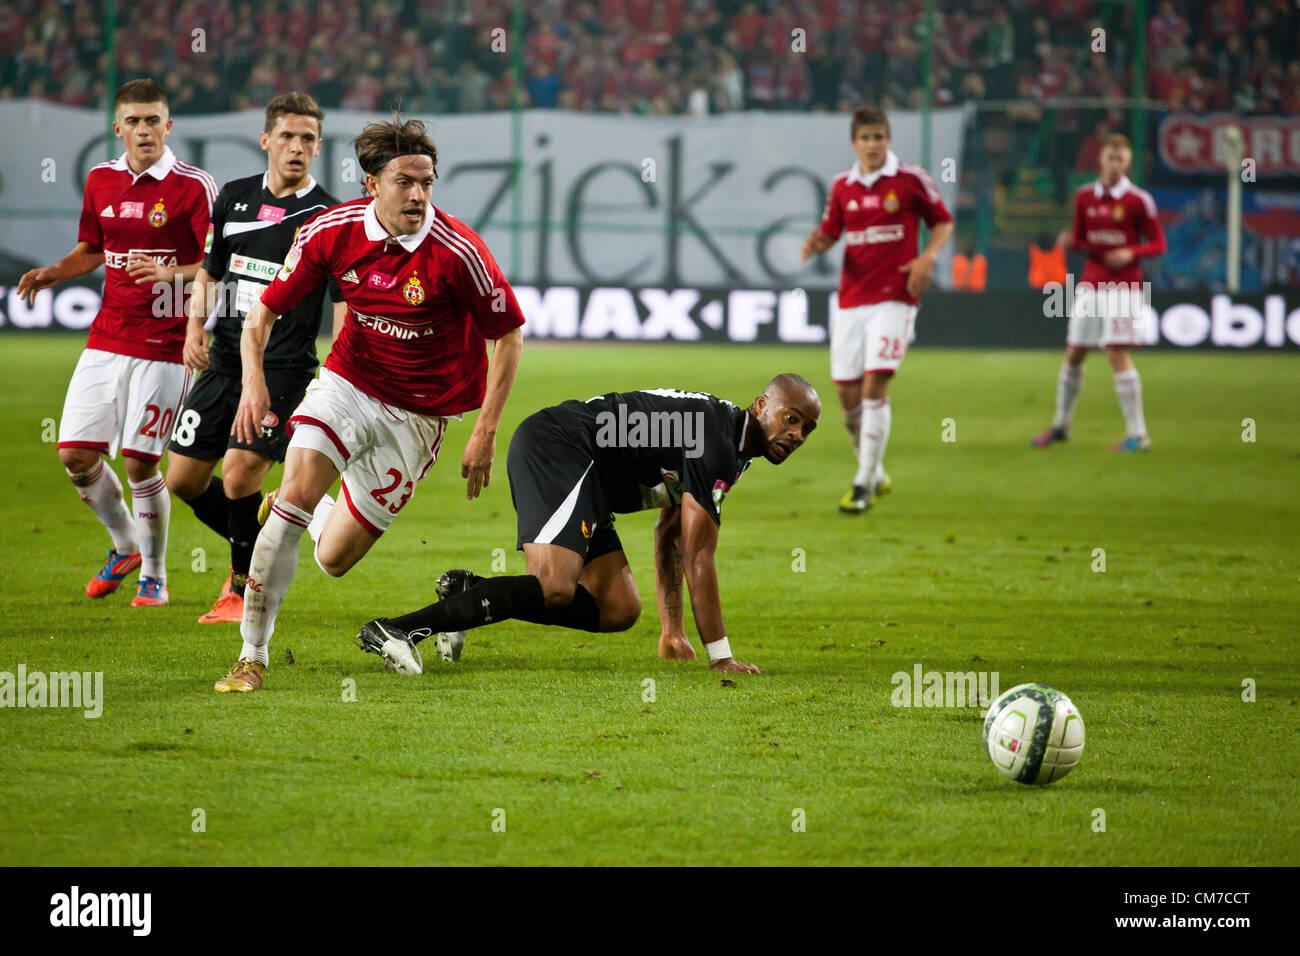 October 20, 2012 Cracow, Poland - Eighth round of Polish Football Extraleague. (L) Daniel Sikorski and (C) Ugochukwu - Stock Image